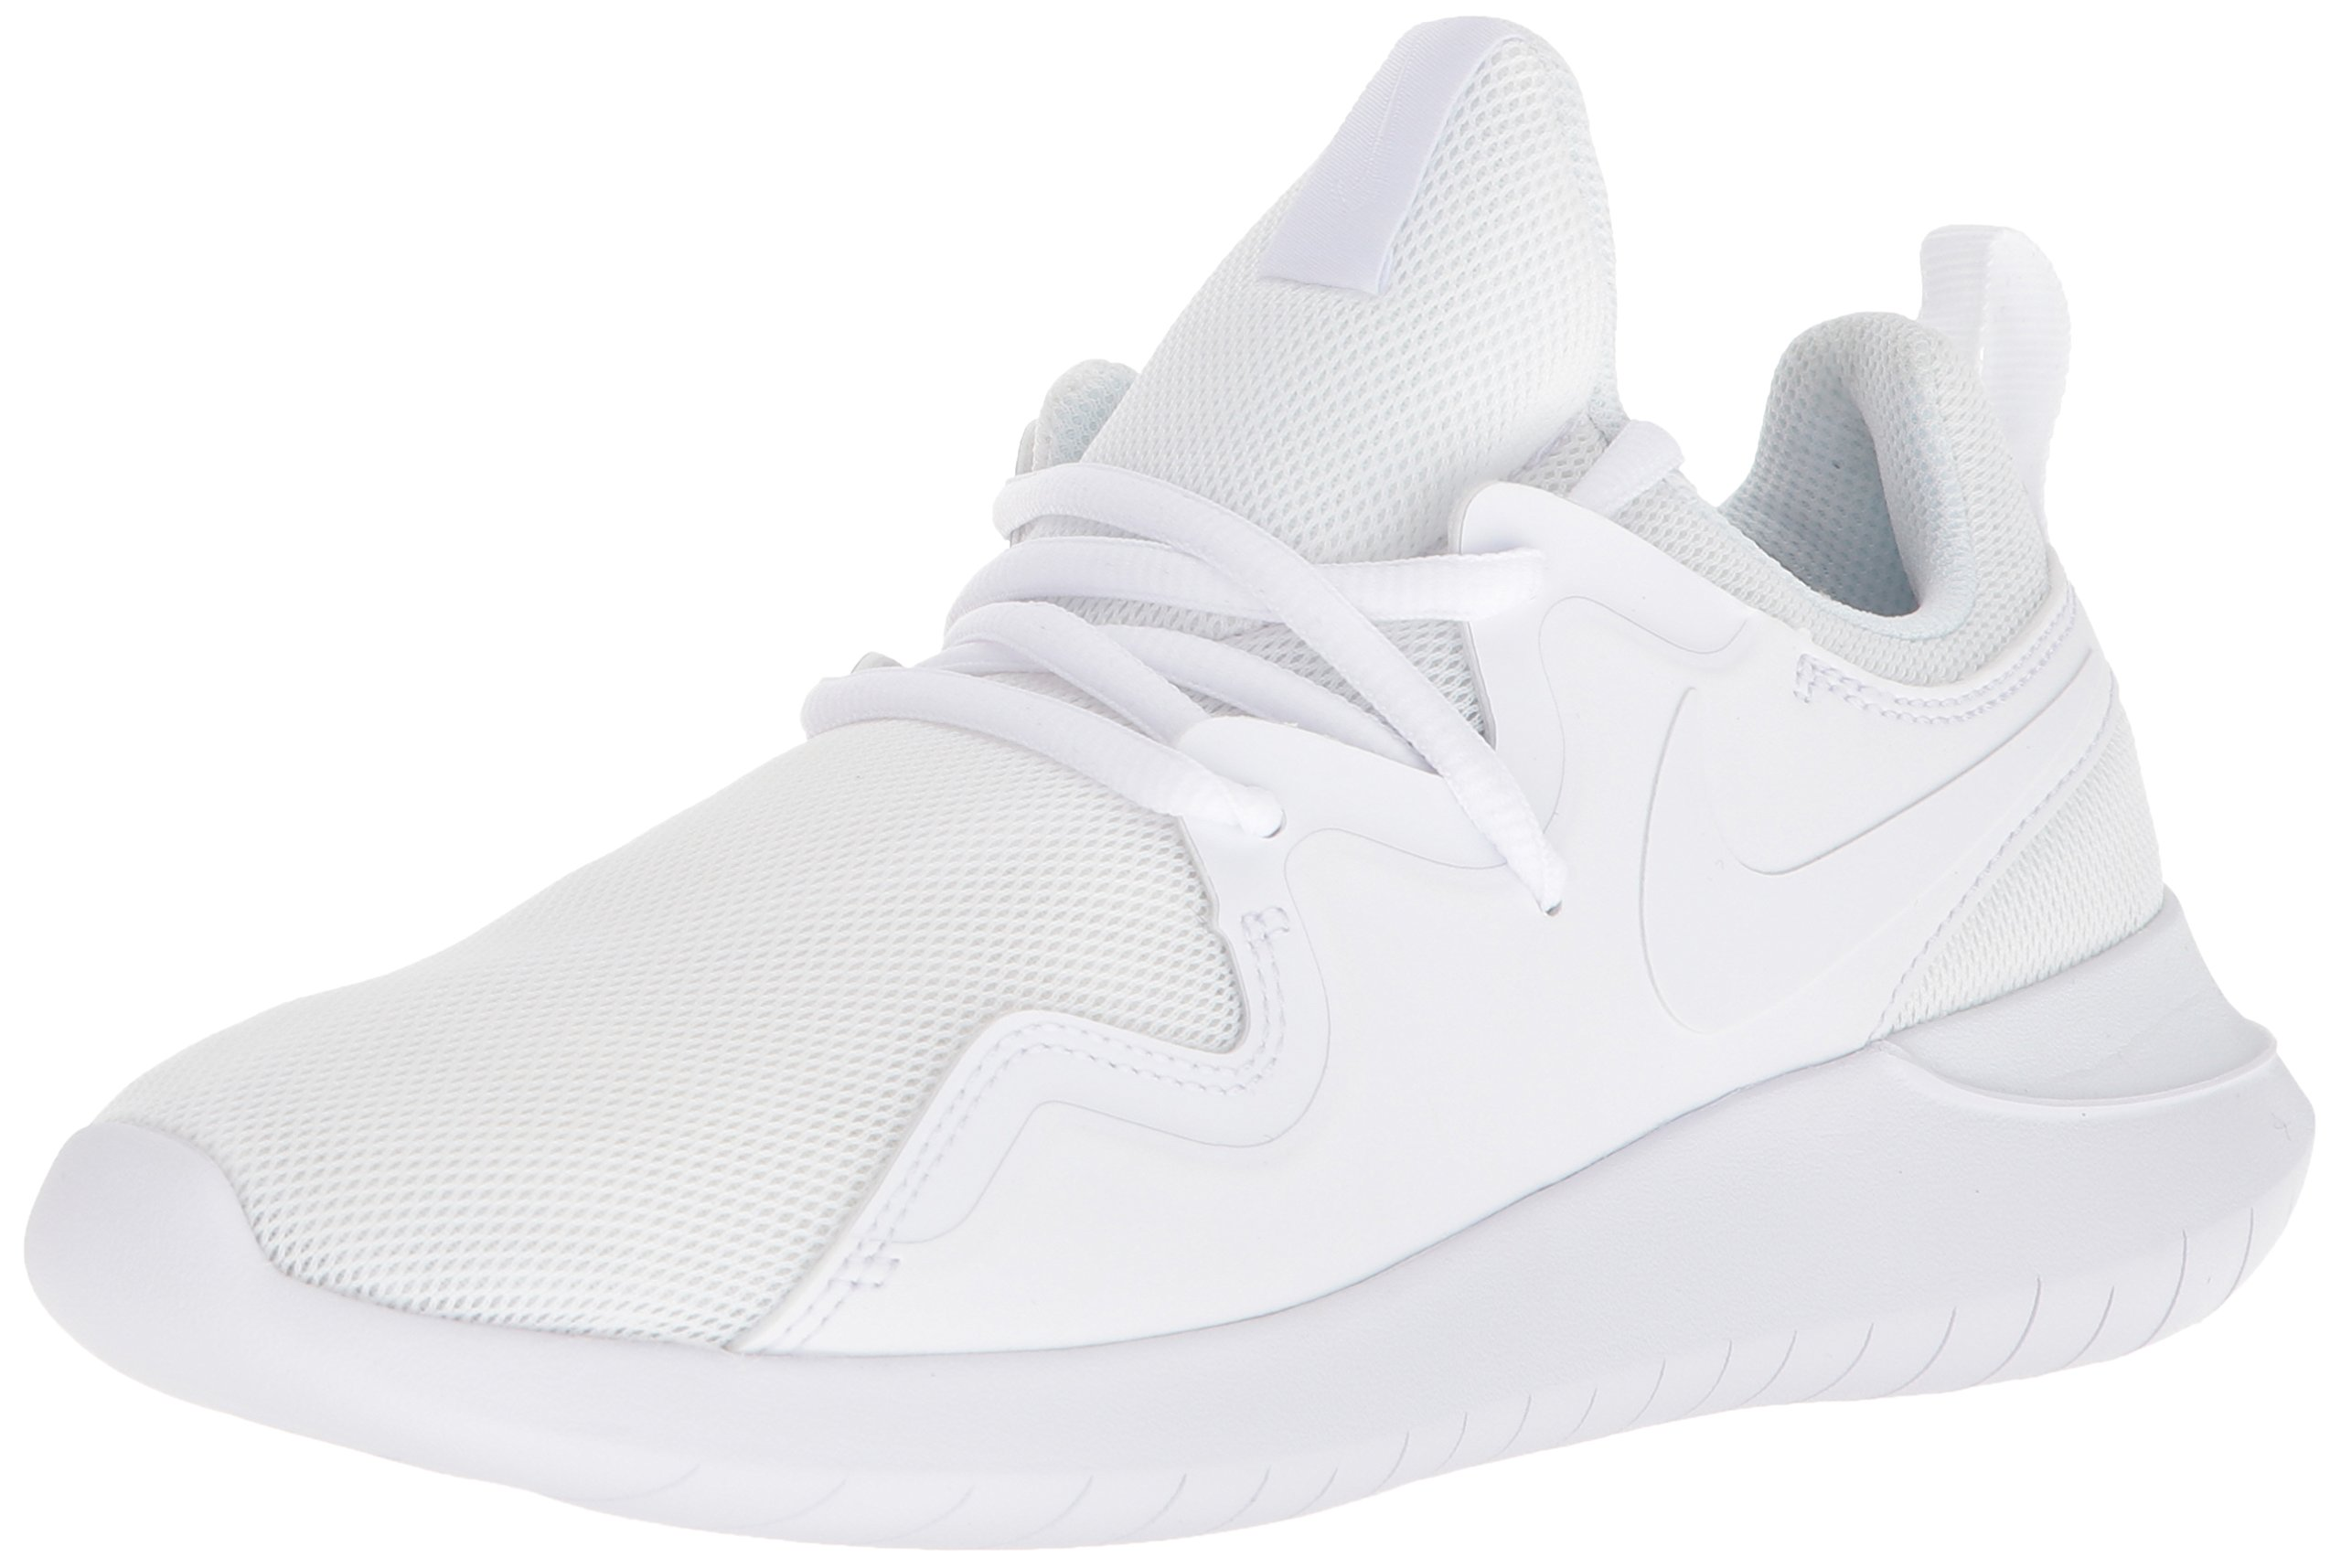 Women's Tessen Running Shoe - Buy